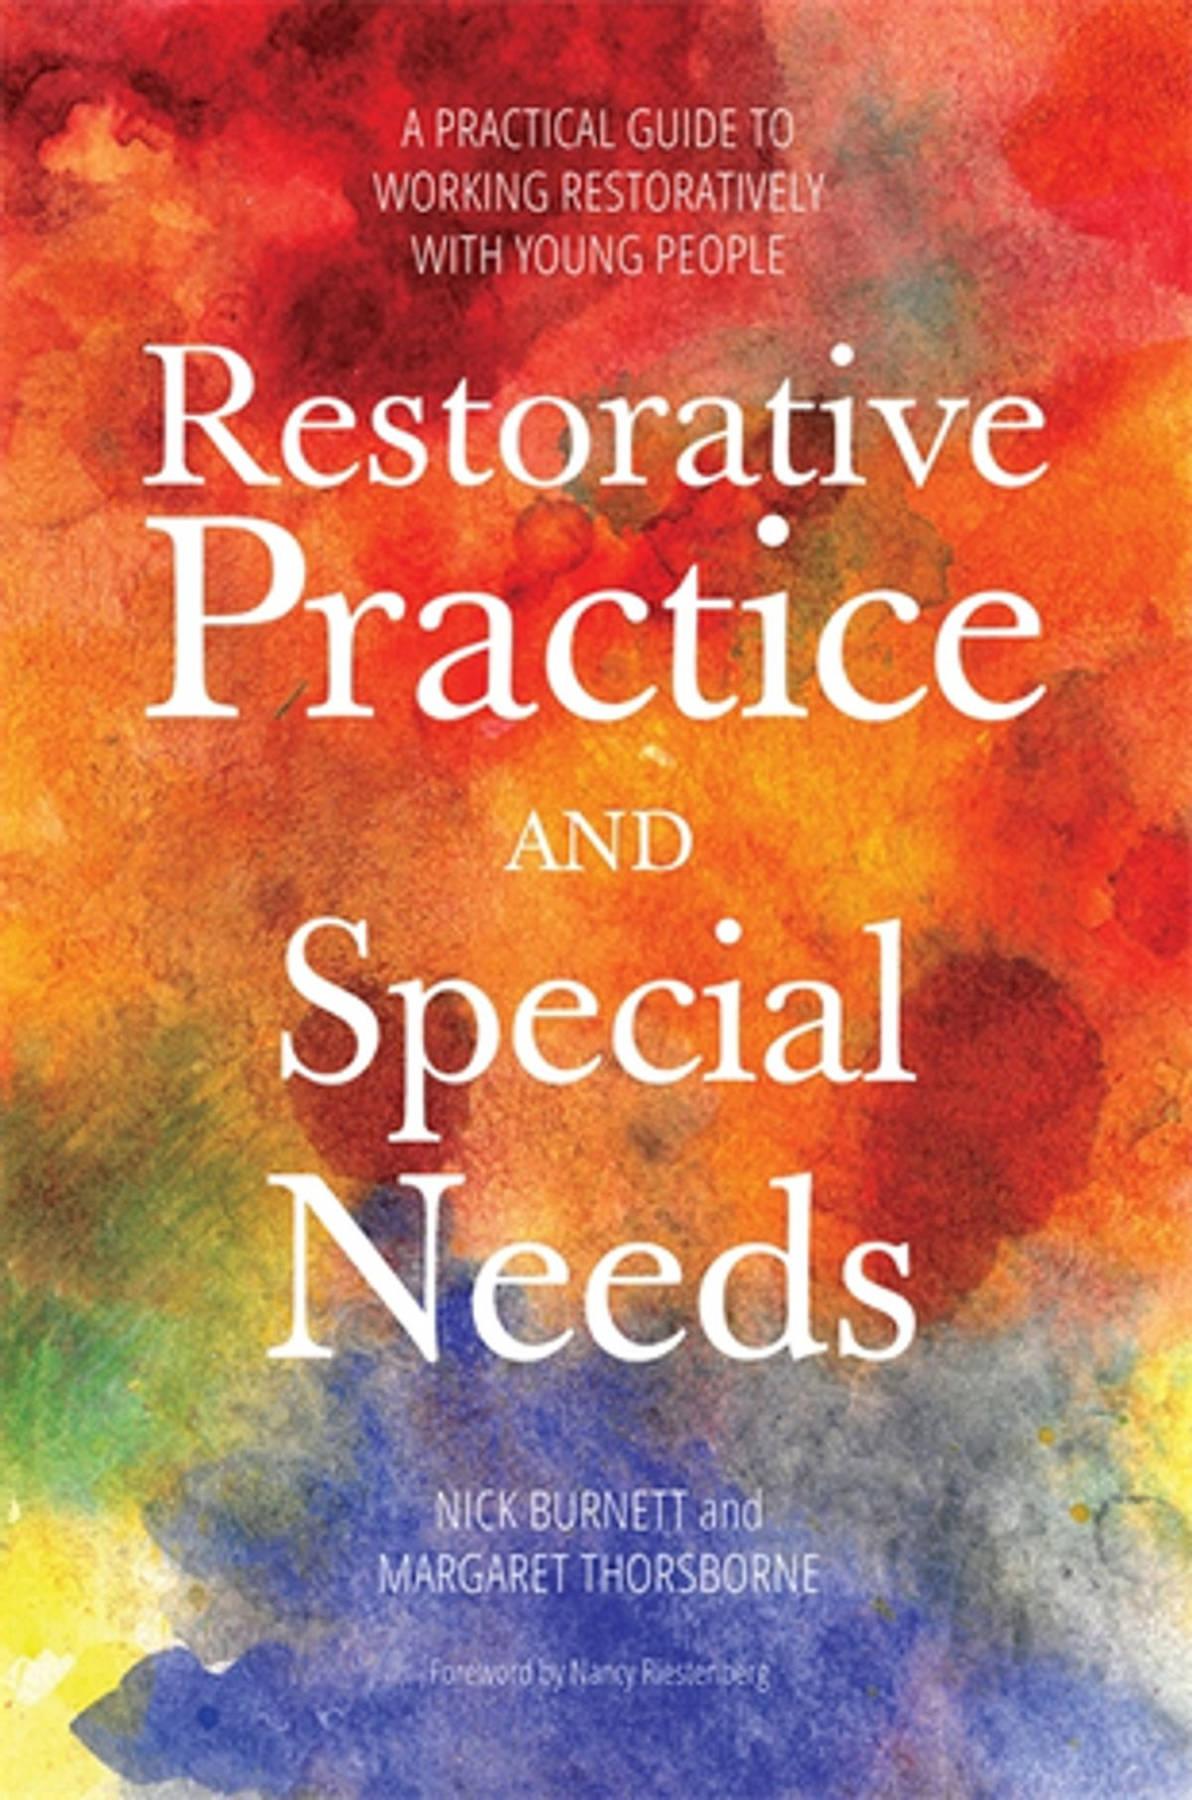 Restorative Practice and Special Needs